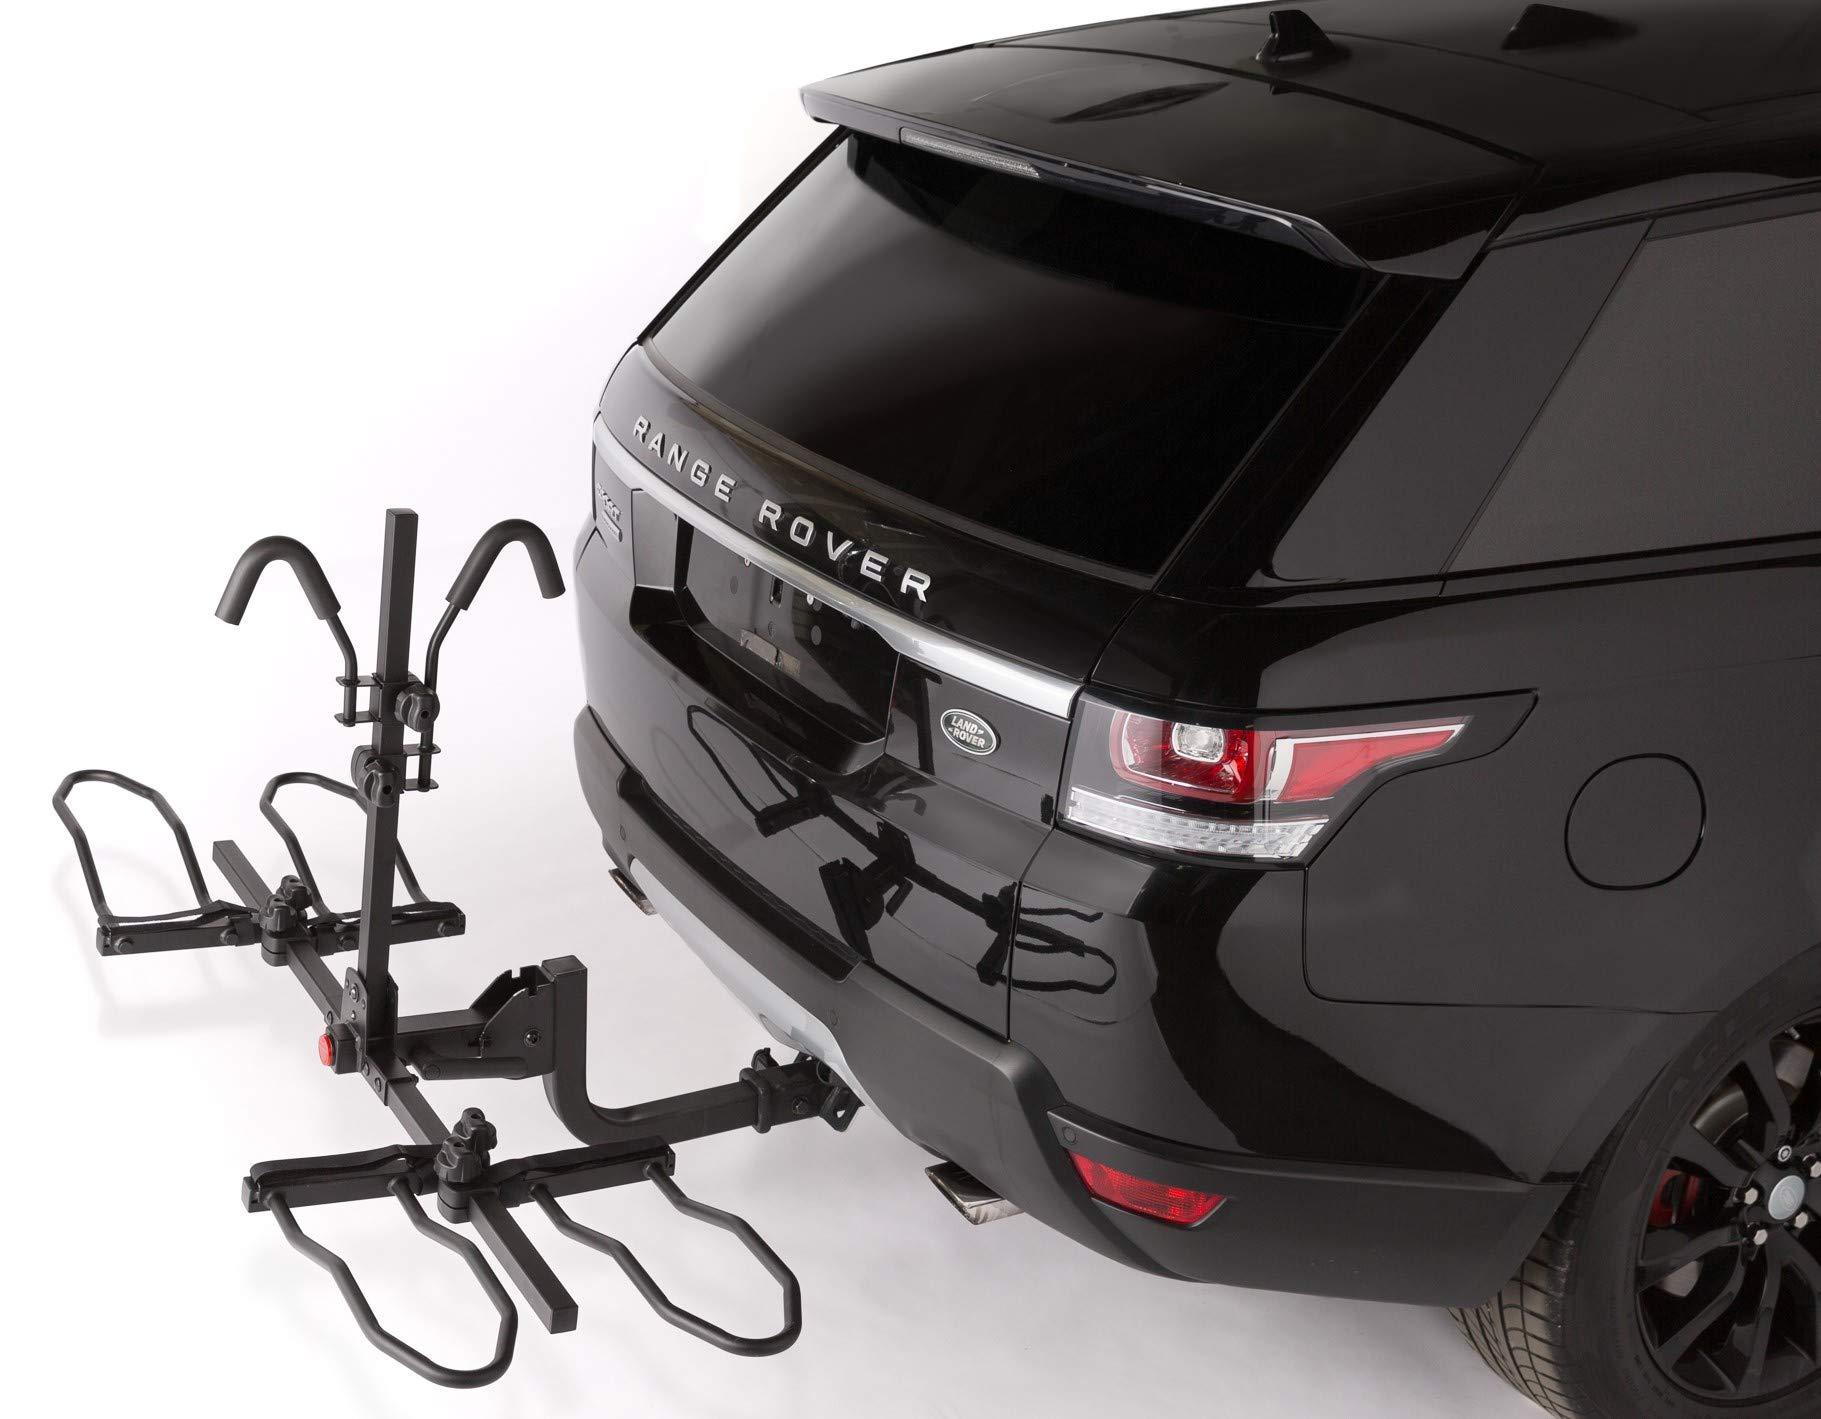 Overdrive Sport 2-Bike Hitch Mounted Rack - Smart Tilting, Platform Style Standard, Fat Tire Electric Bikes